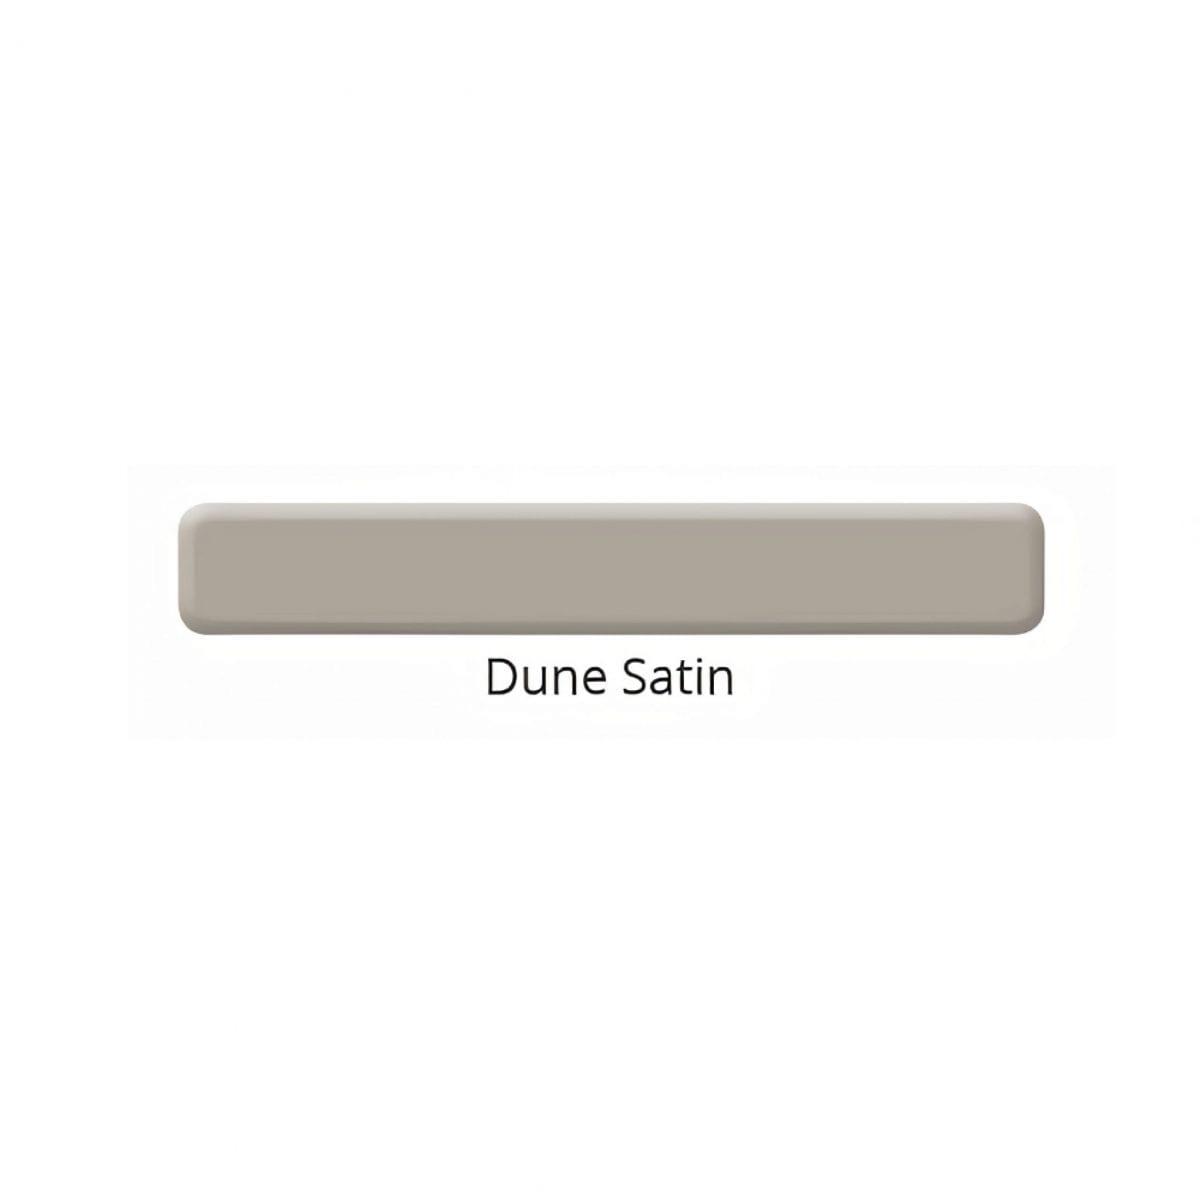 Dune Satin